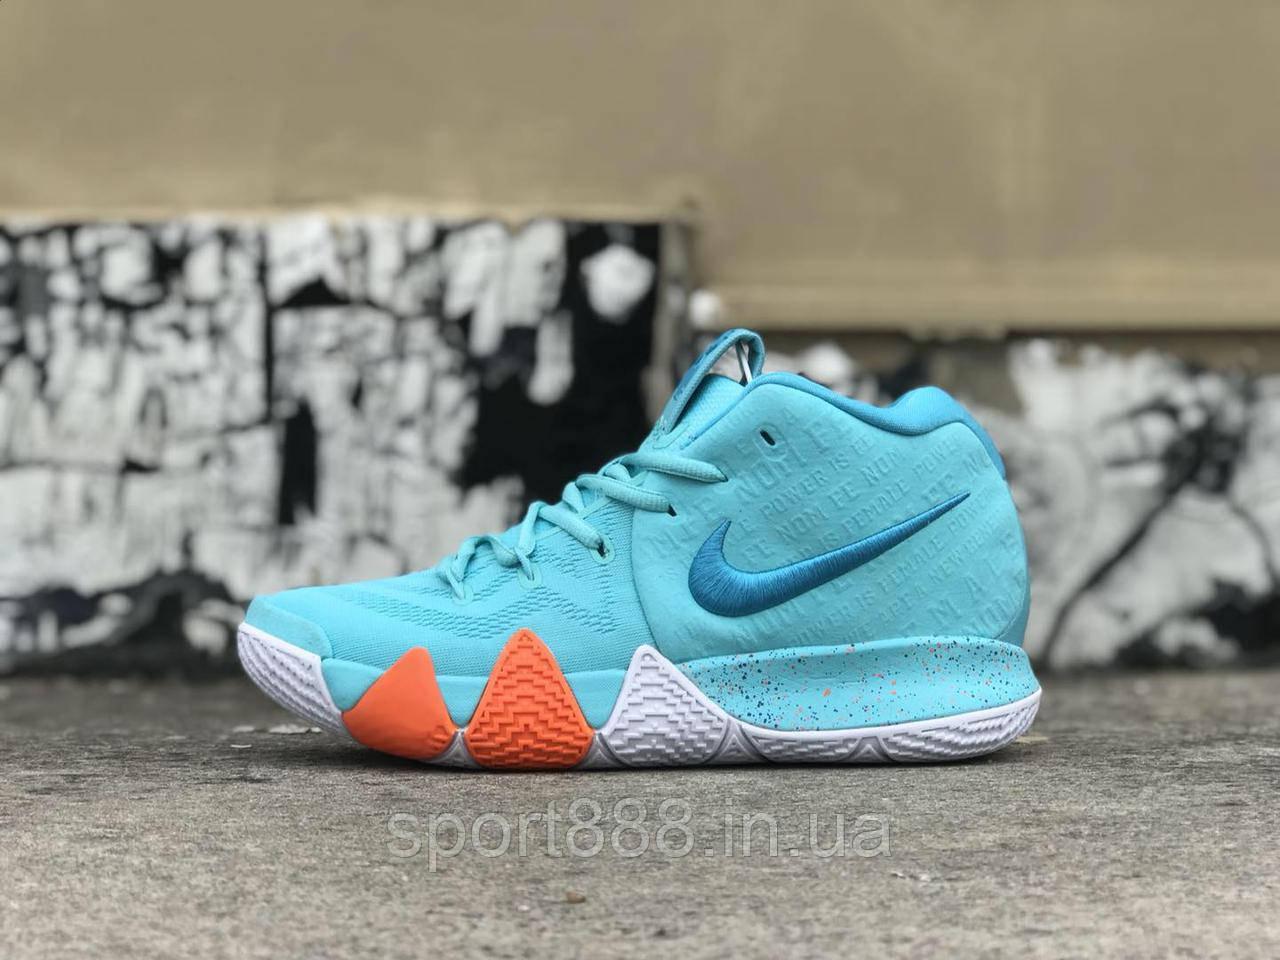 sale retailer f45d2 57a14 Nike Kyrie 4 Power is Female мужские кроссовки - Bigl.ua